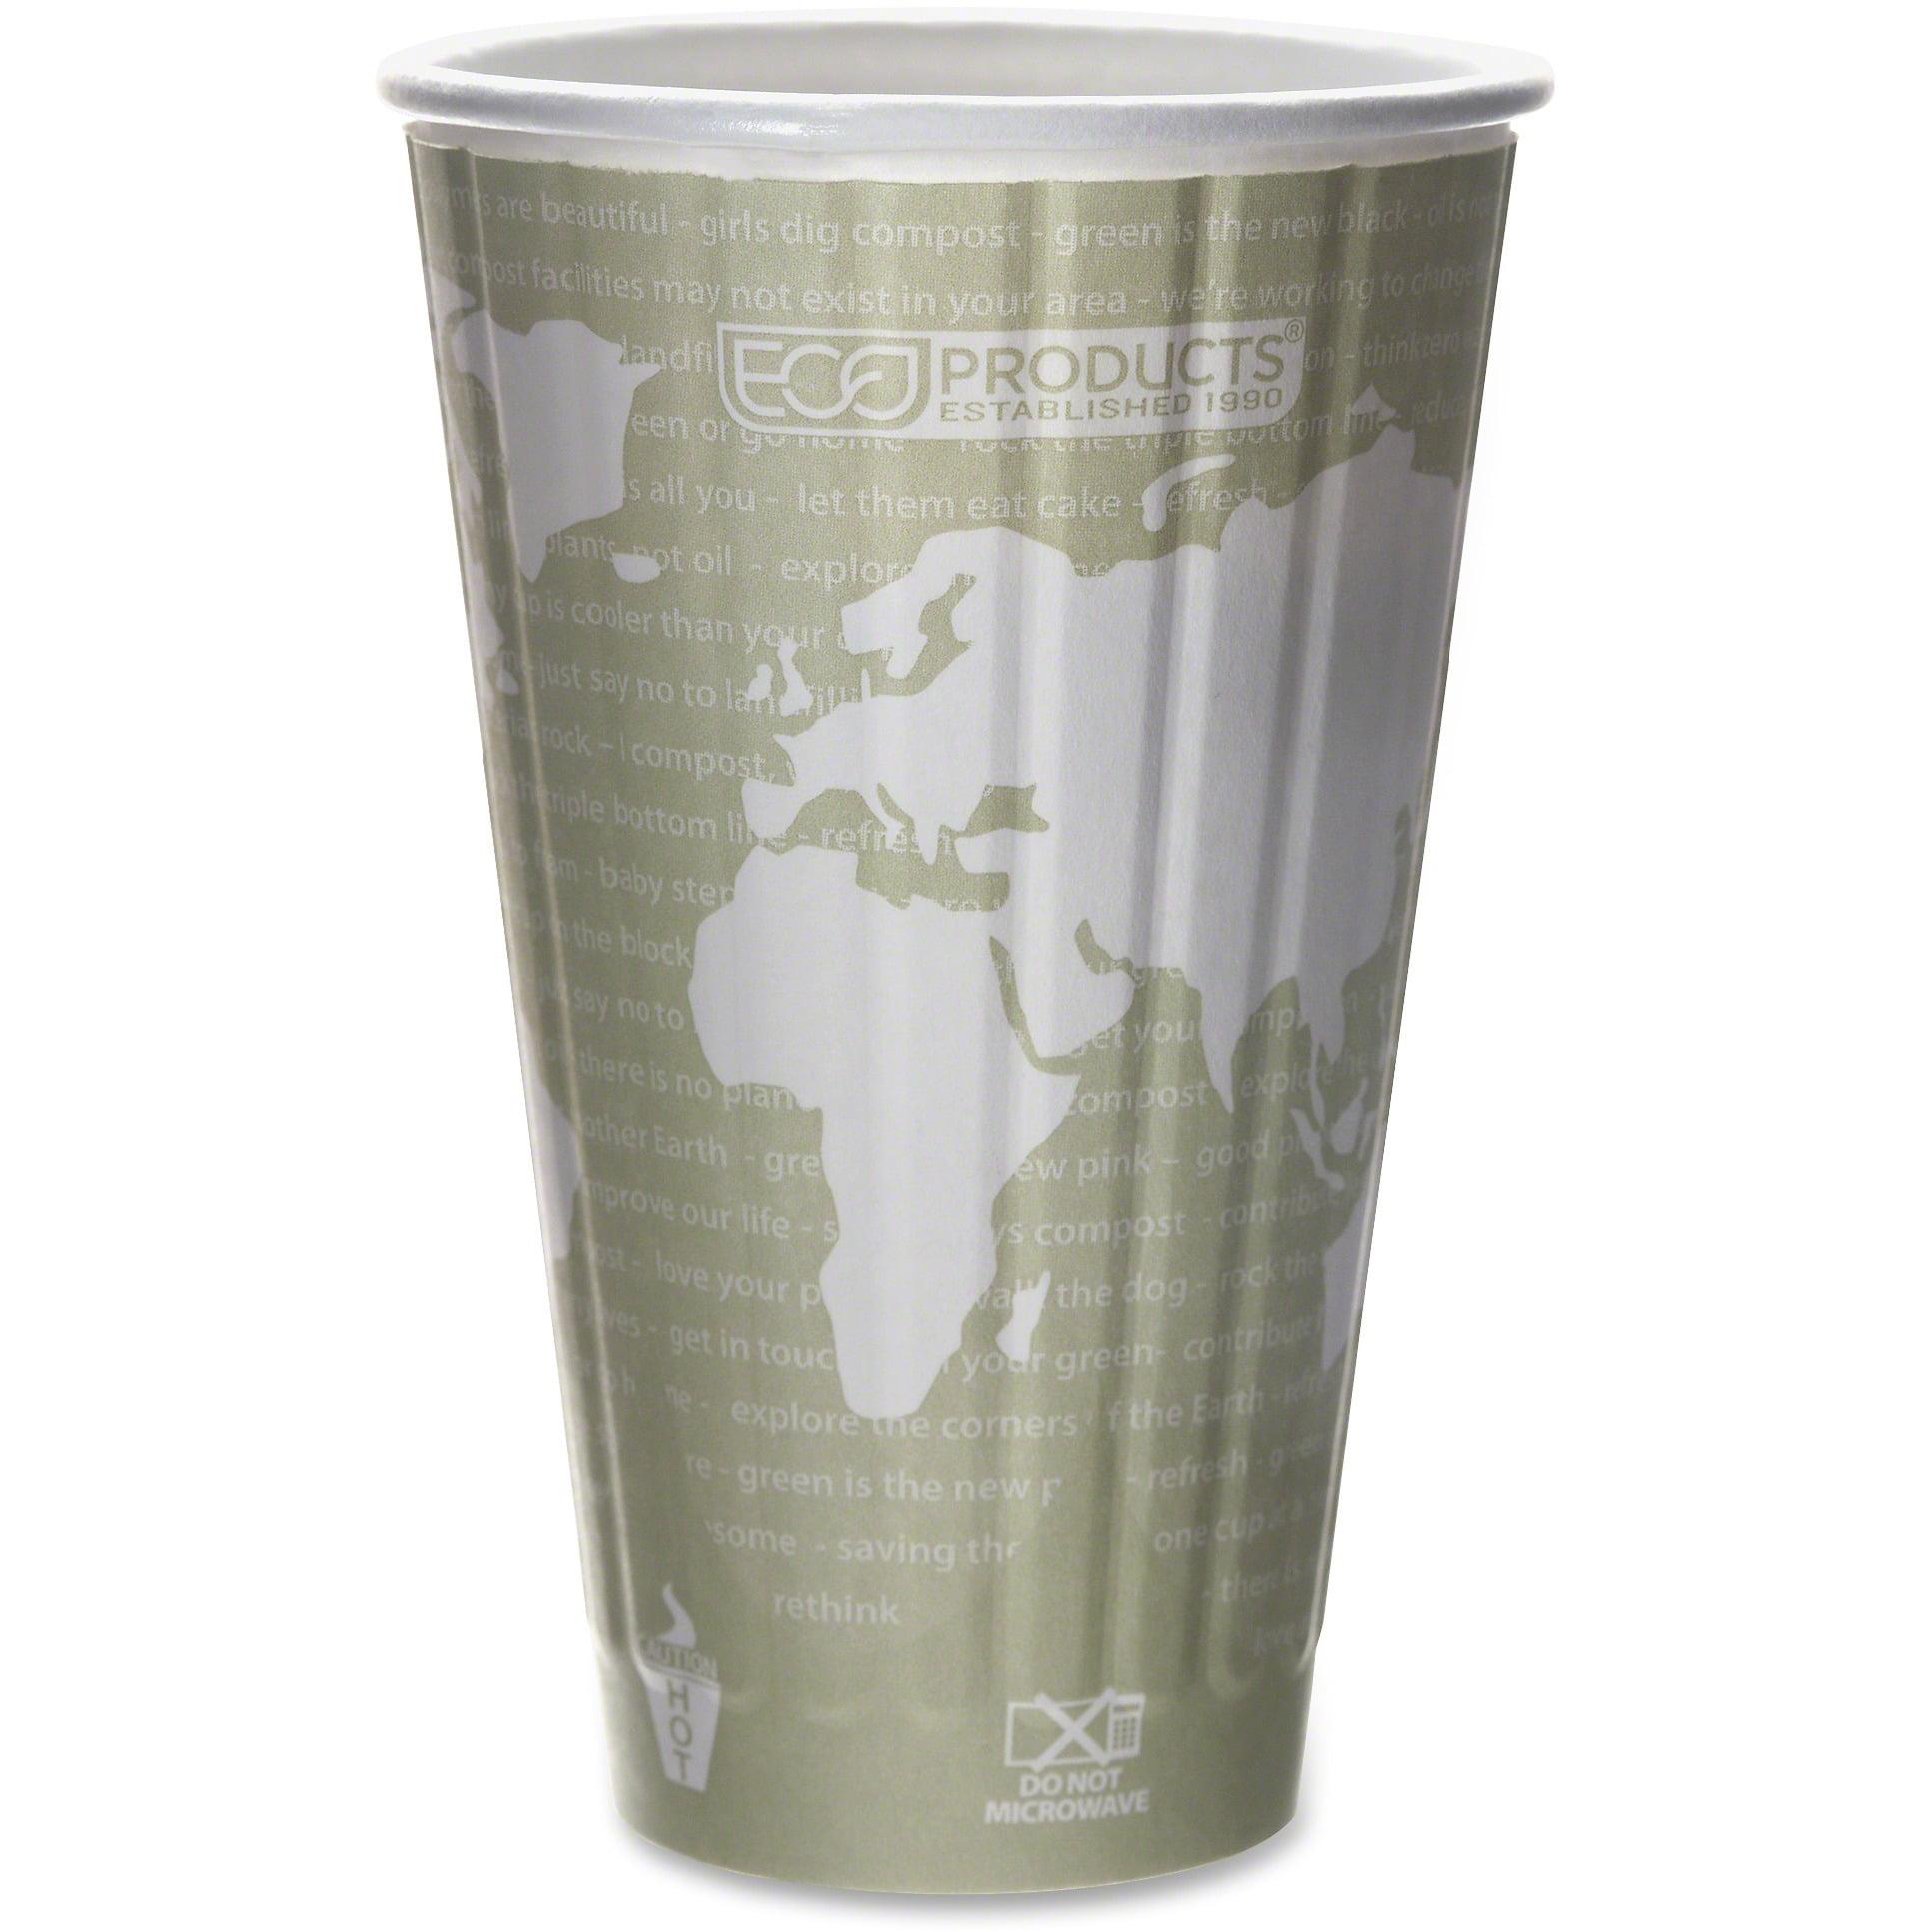 Eco-Products, ECOEPBNHC16WD, World Art Insulated Hot Cups, 600 / Carton, Tan, 16 fl oz